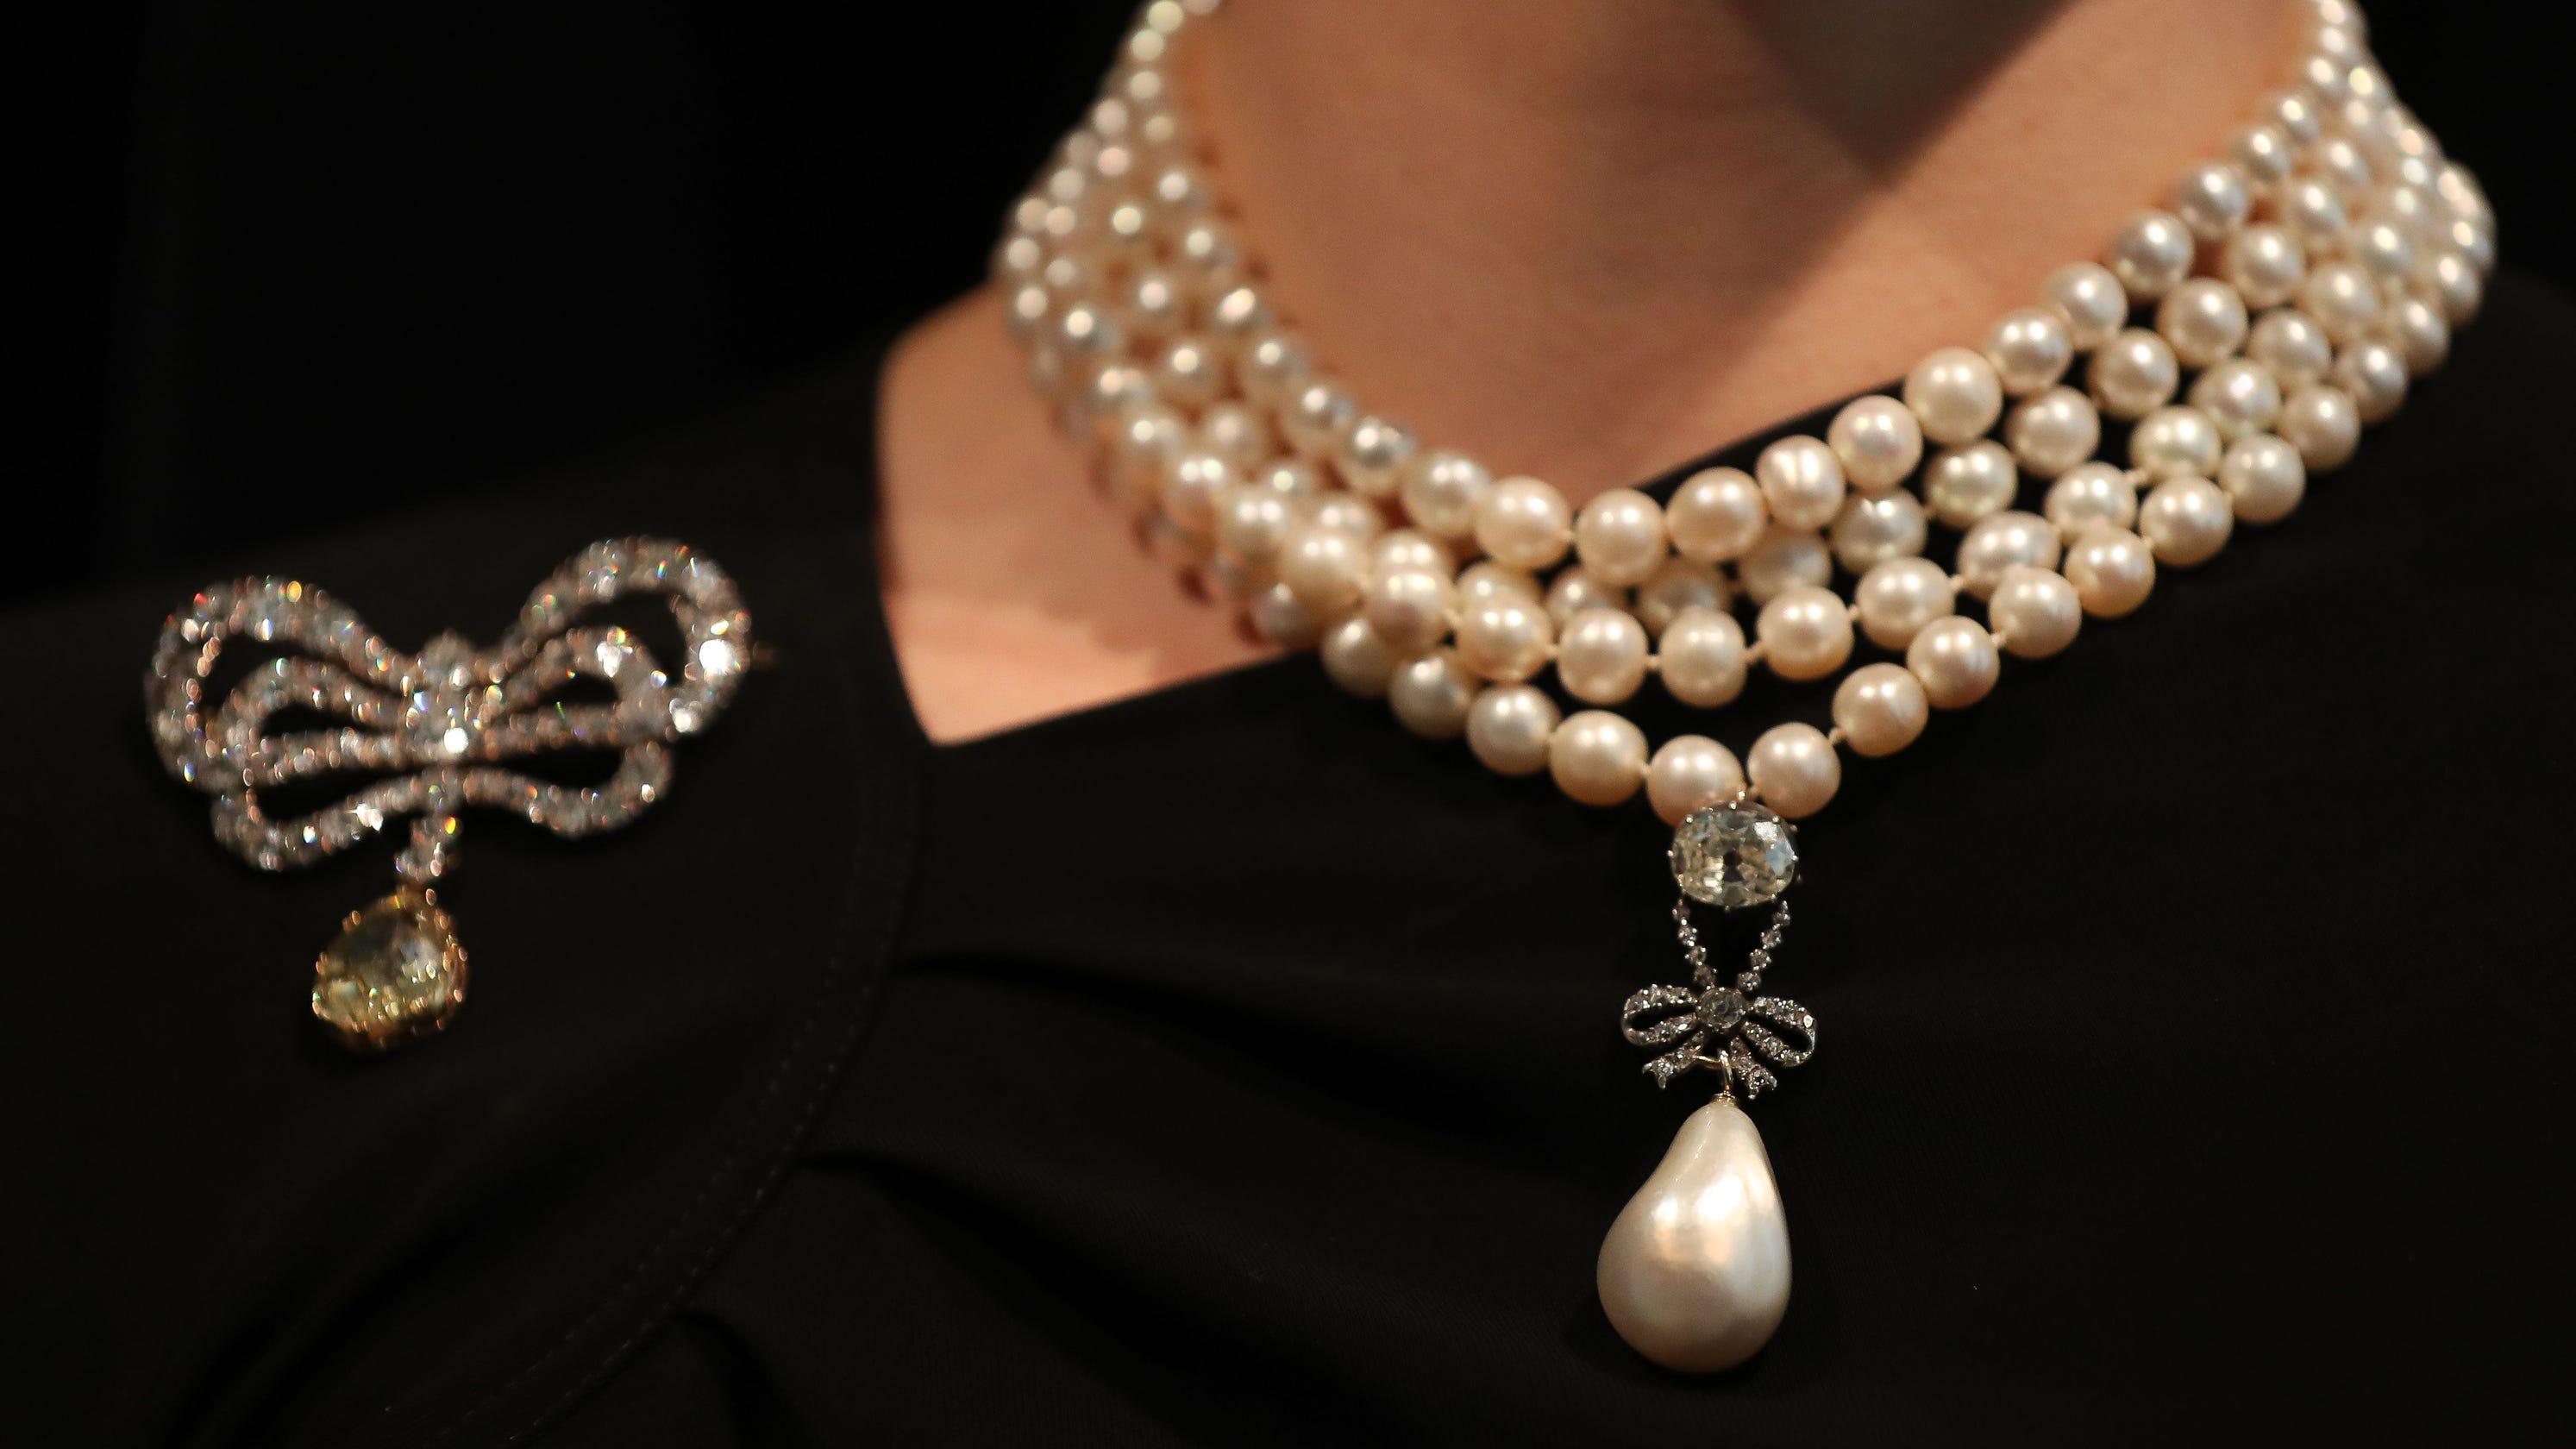 Marie Antoinette Pearl Reaps Record 36 Million